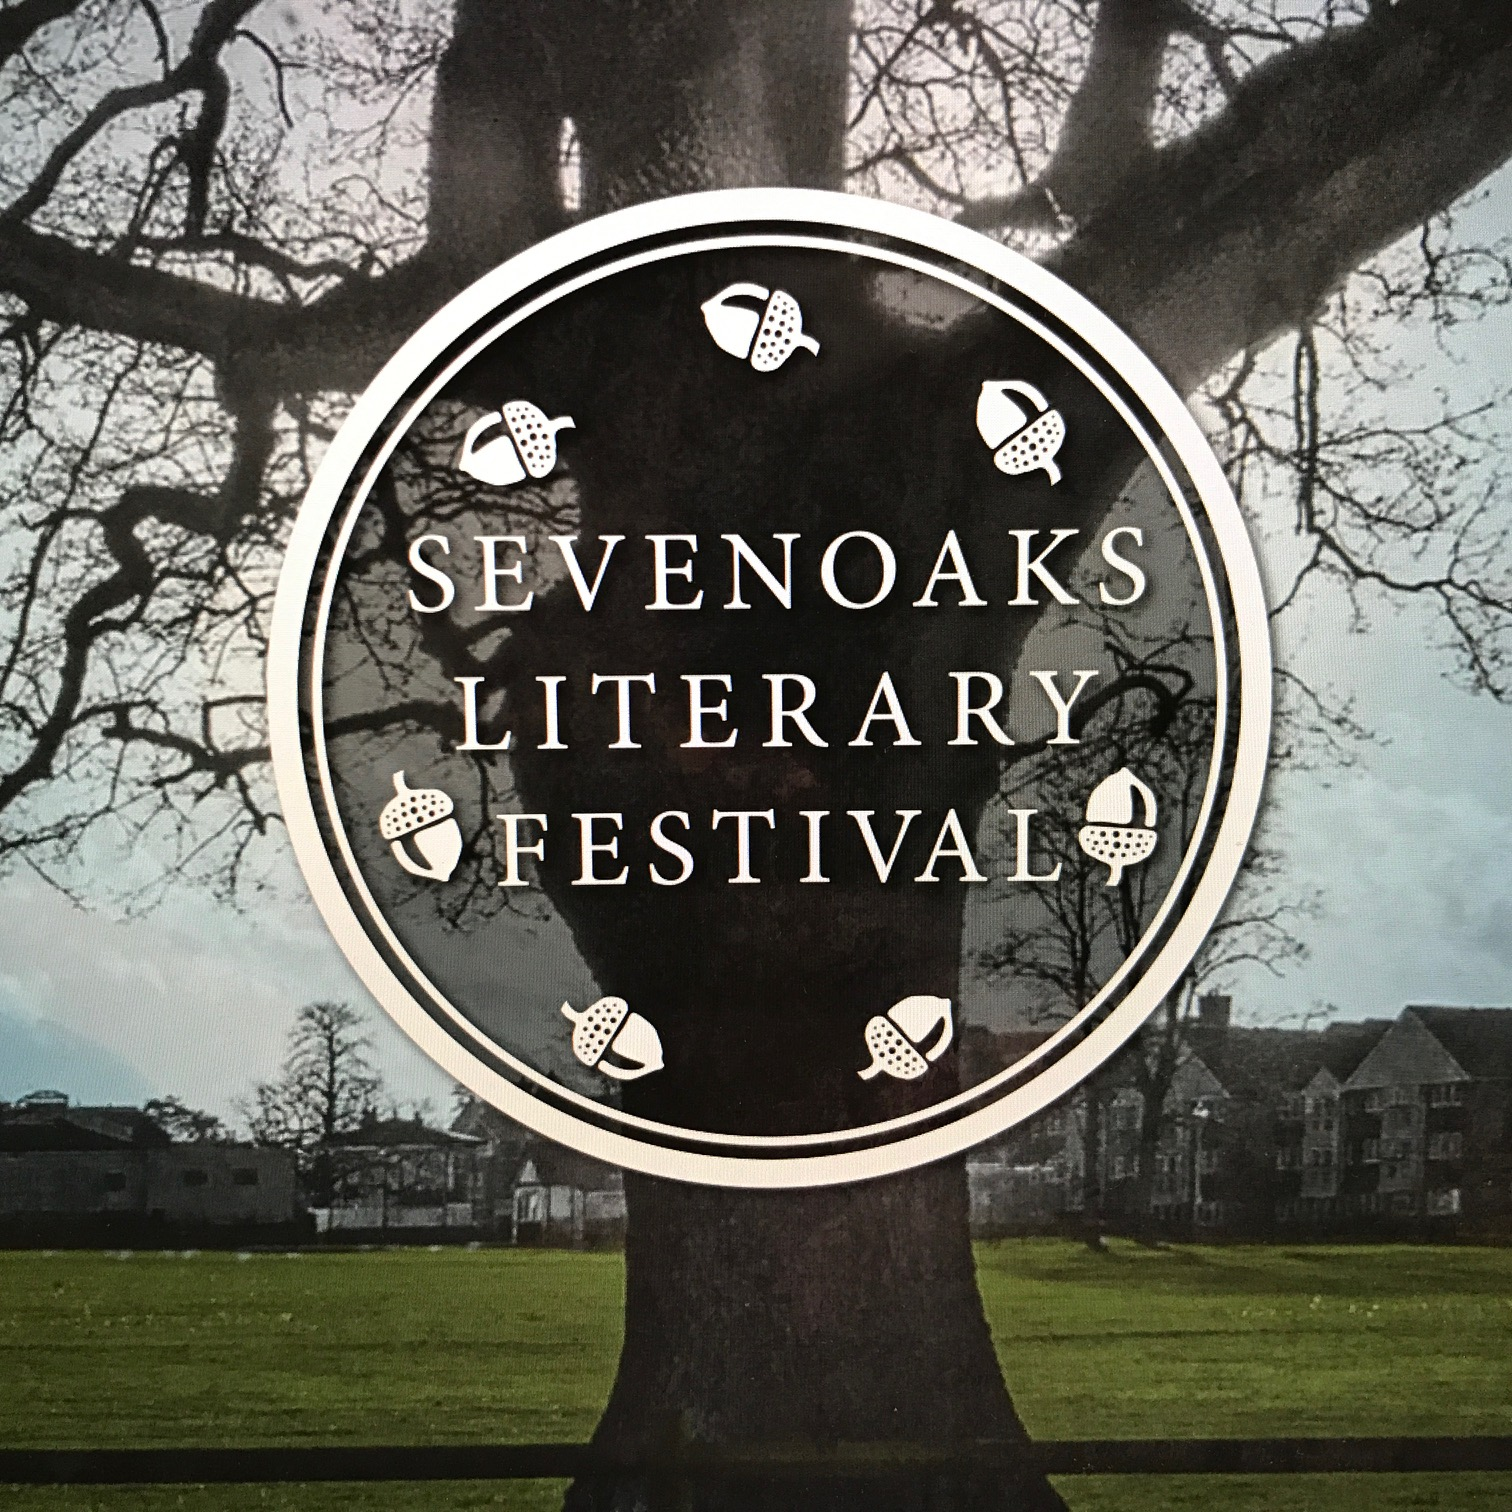 Sevenoaks Literary Festival logo